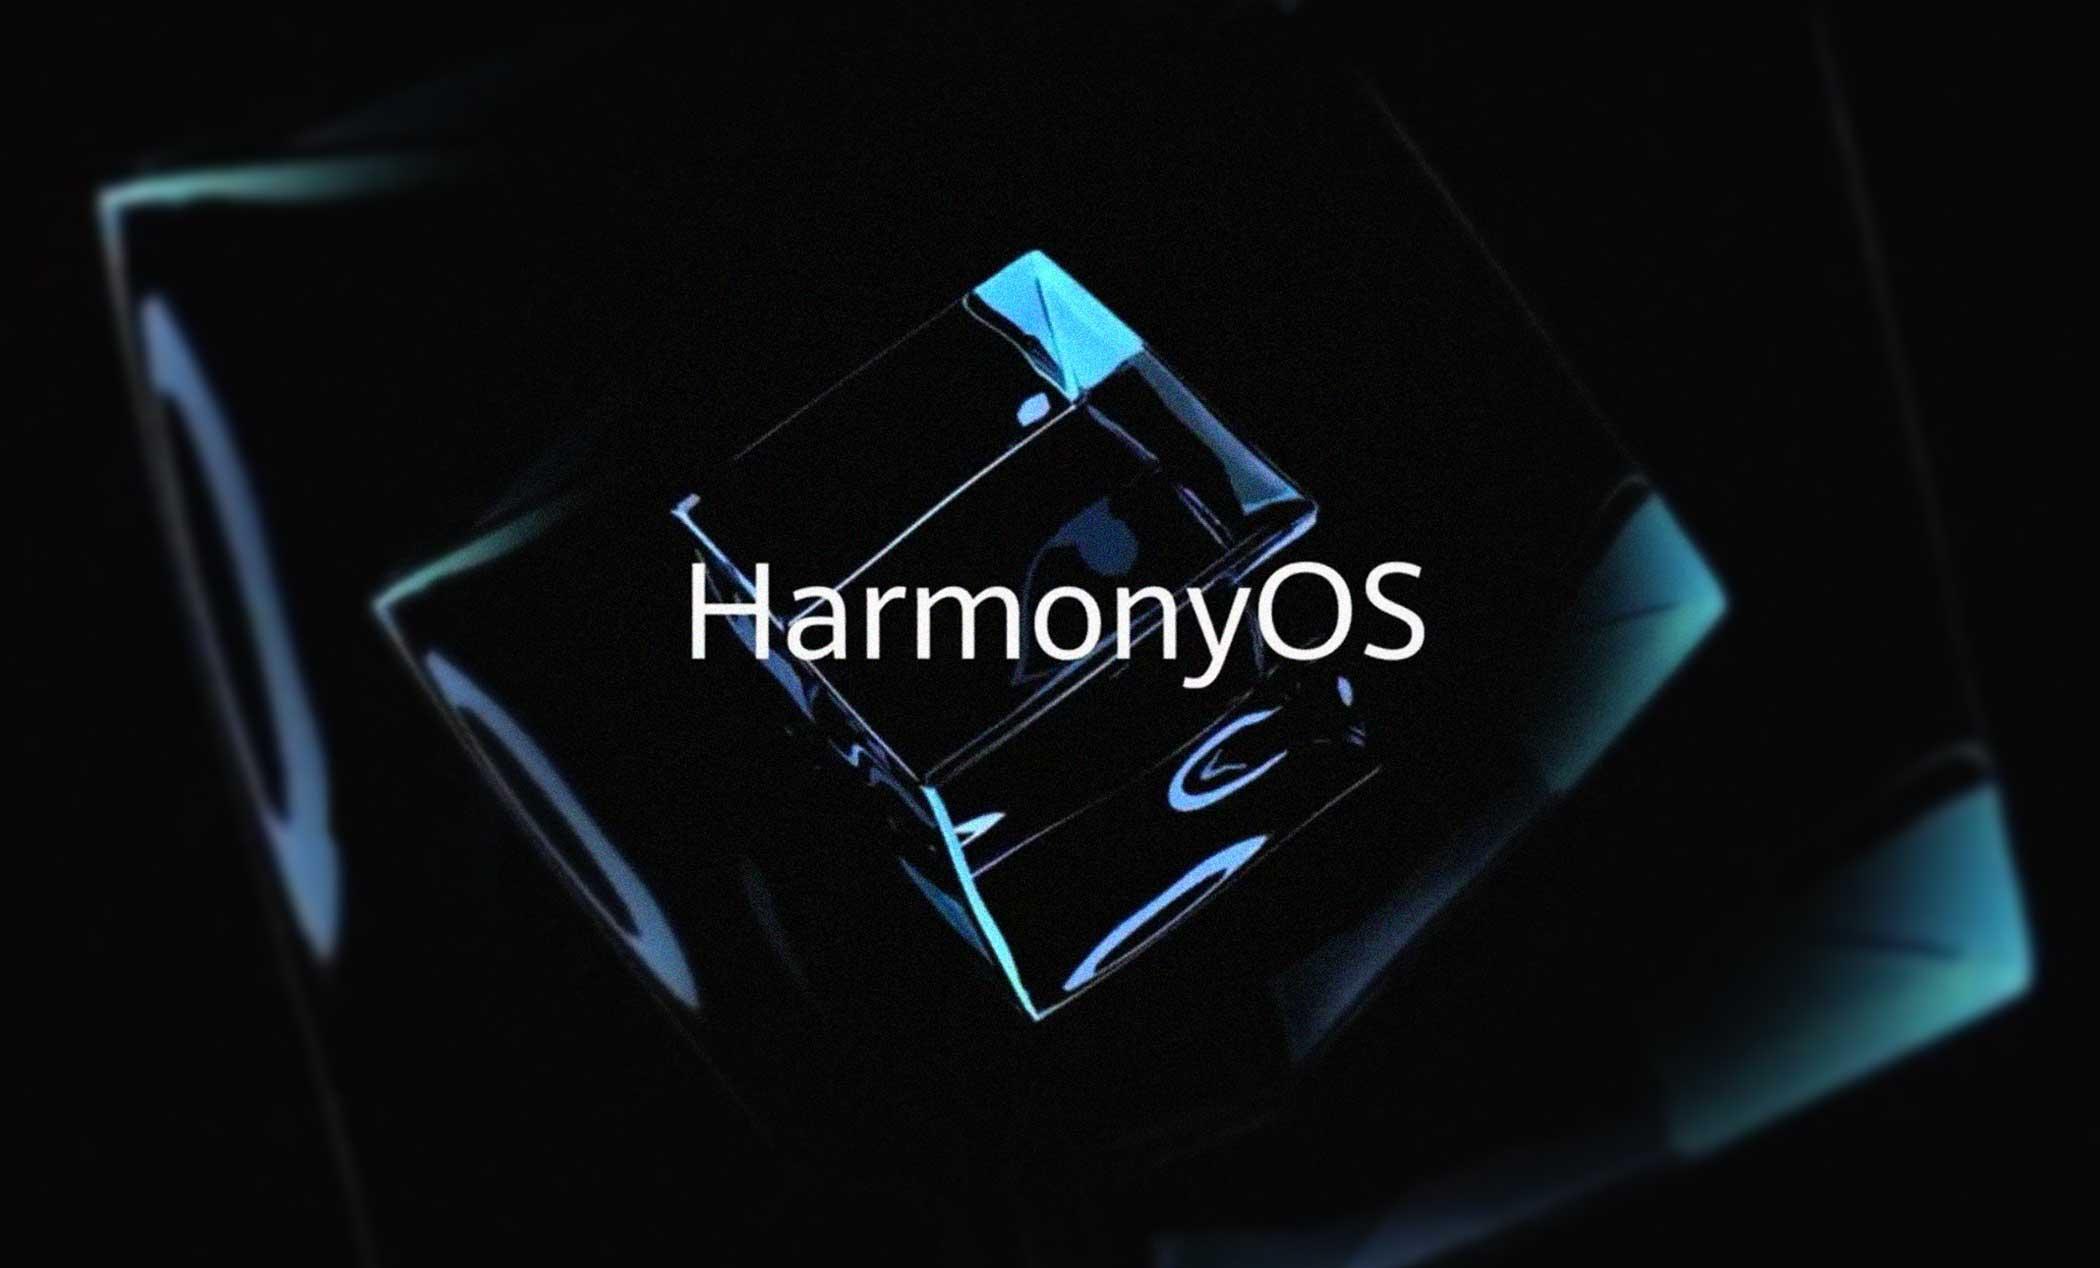 harmonyOS tit